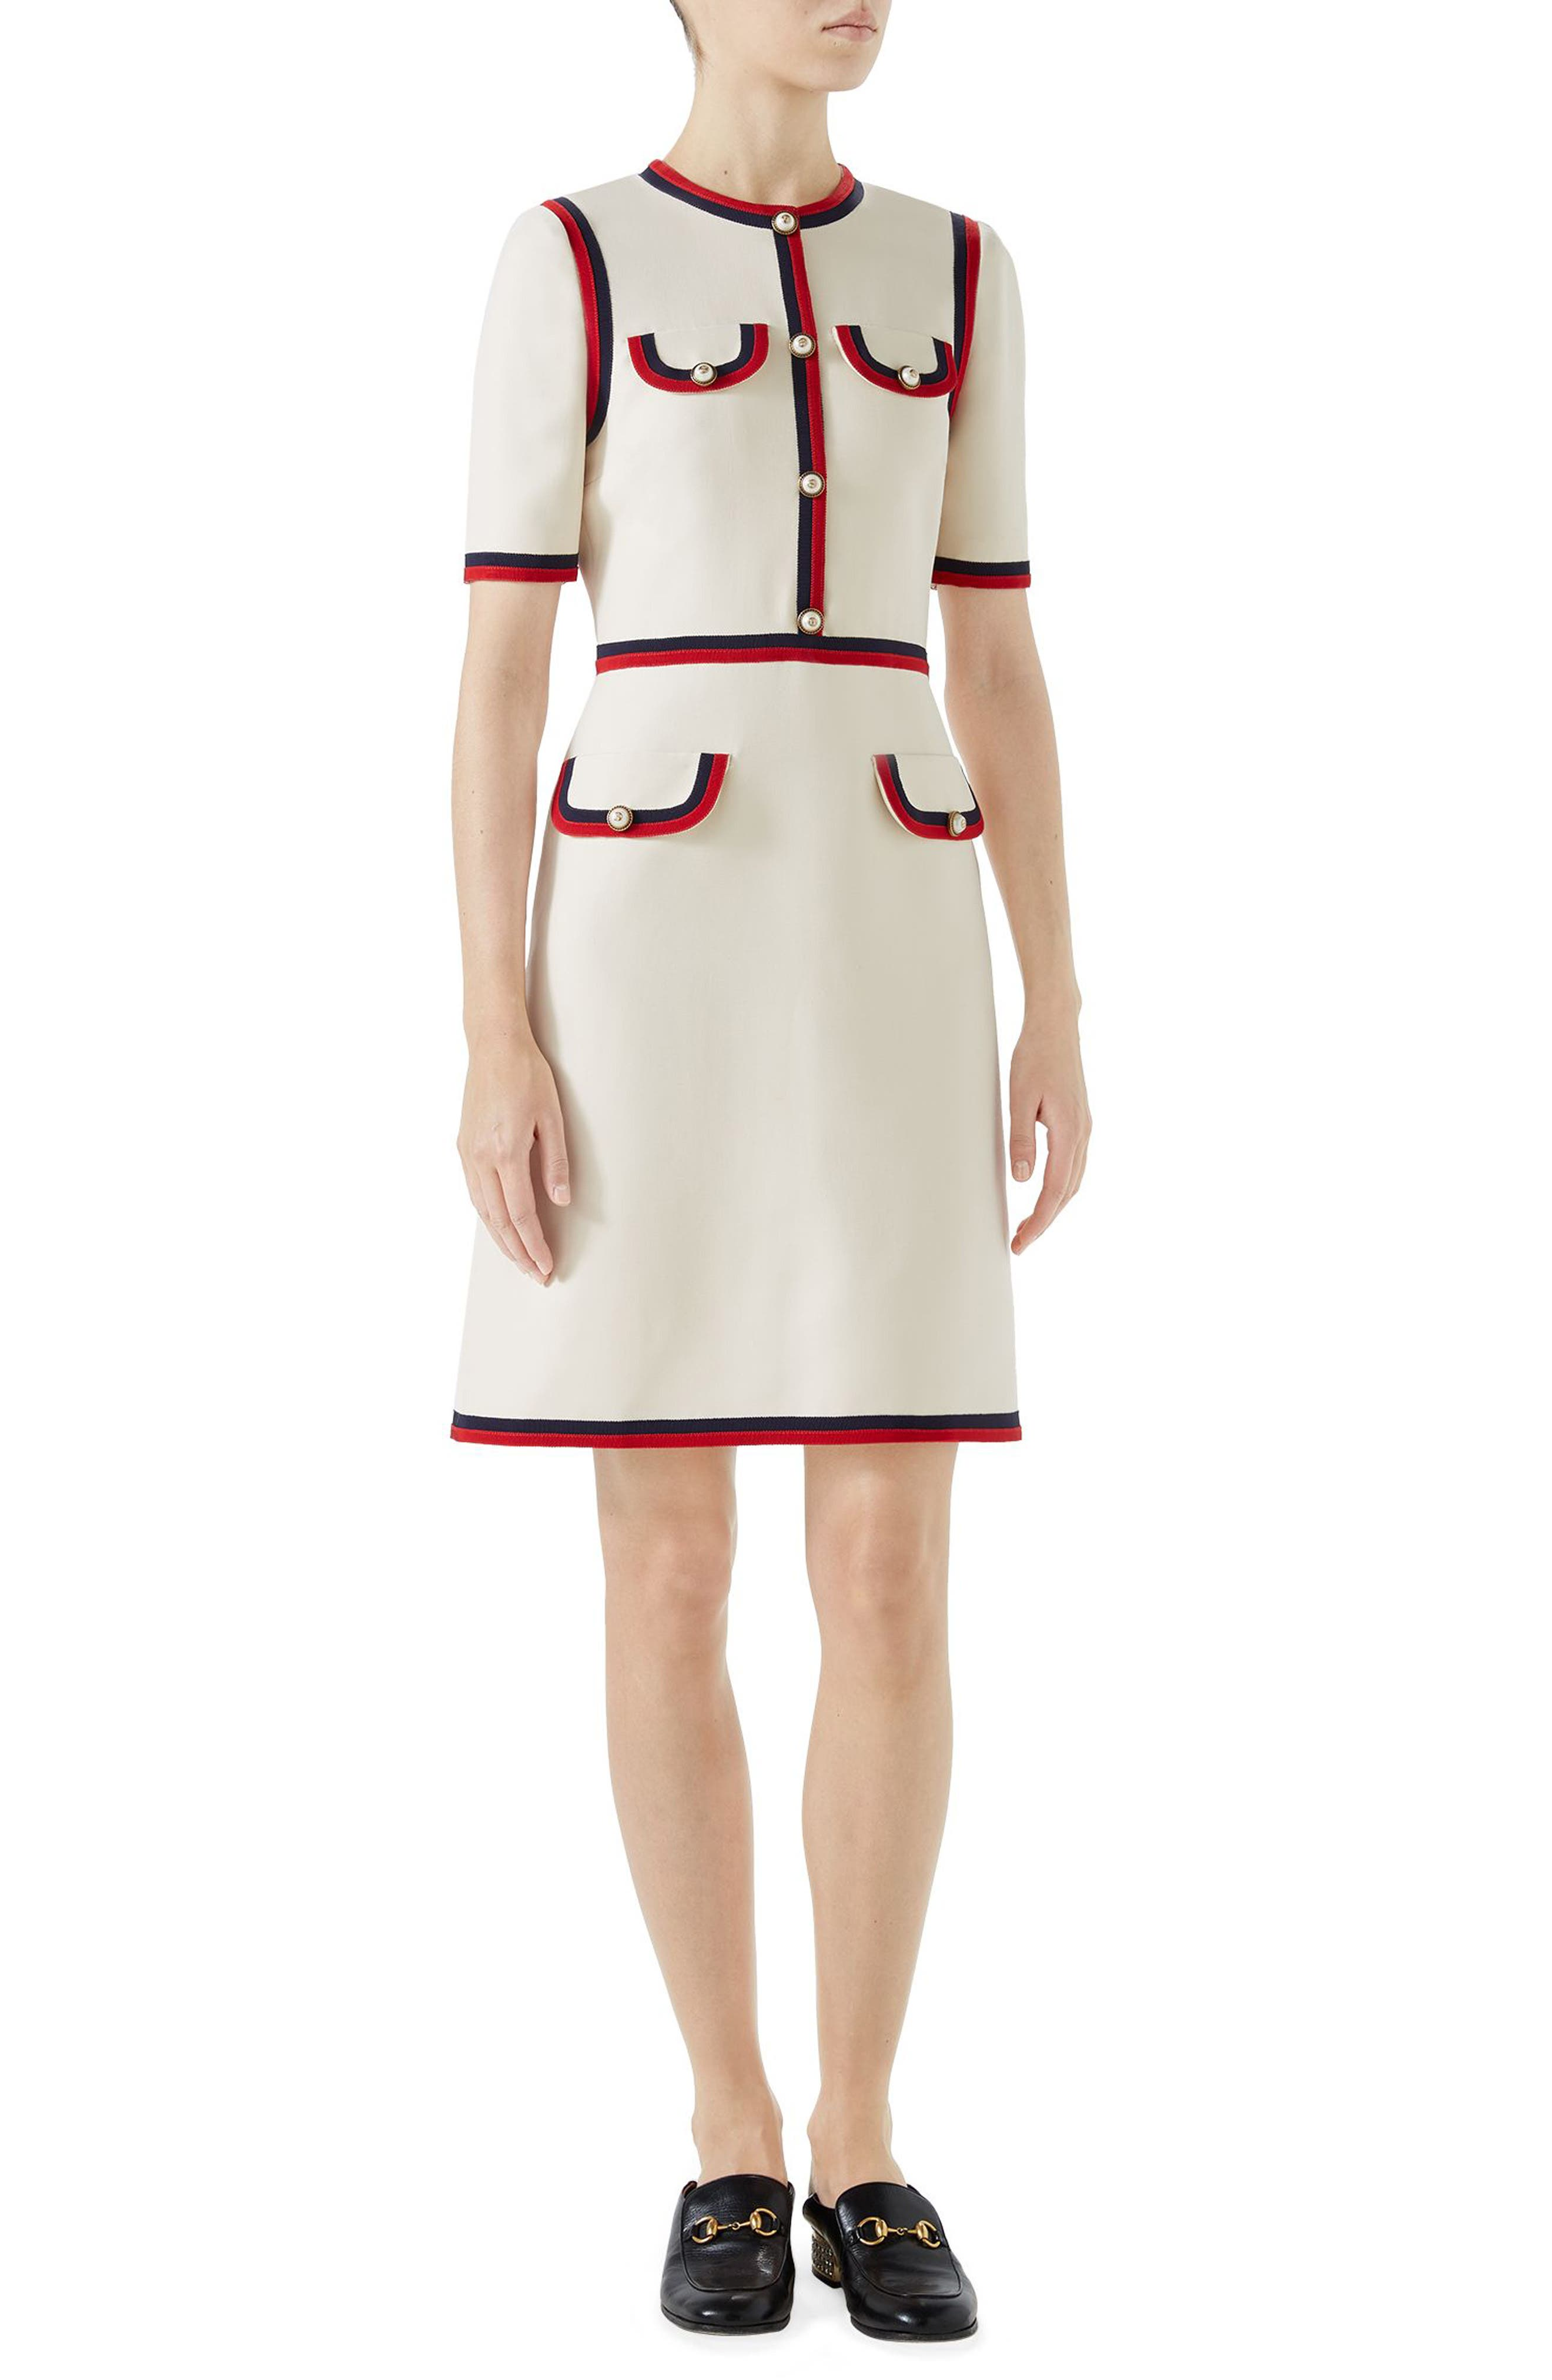 1960s Dresses | 60s Dresses Mod, Mini, Jakie O, Hippie Womens Gucci Ribbon Trim Wool  Silk Crepe A-Line Dress $2,700.00 AT vintagedancer.com